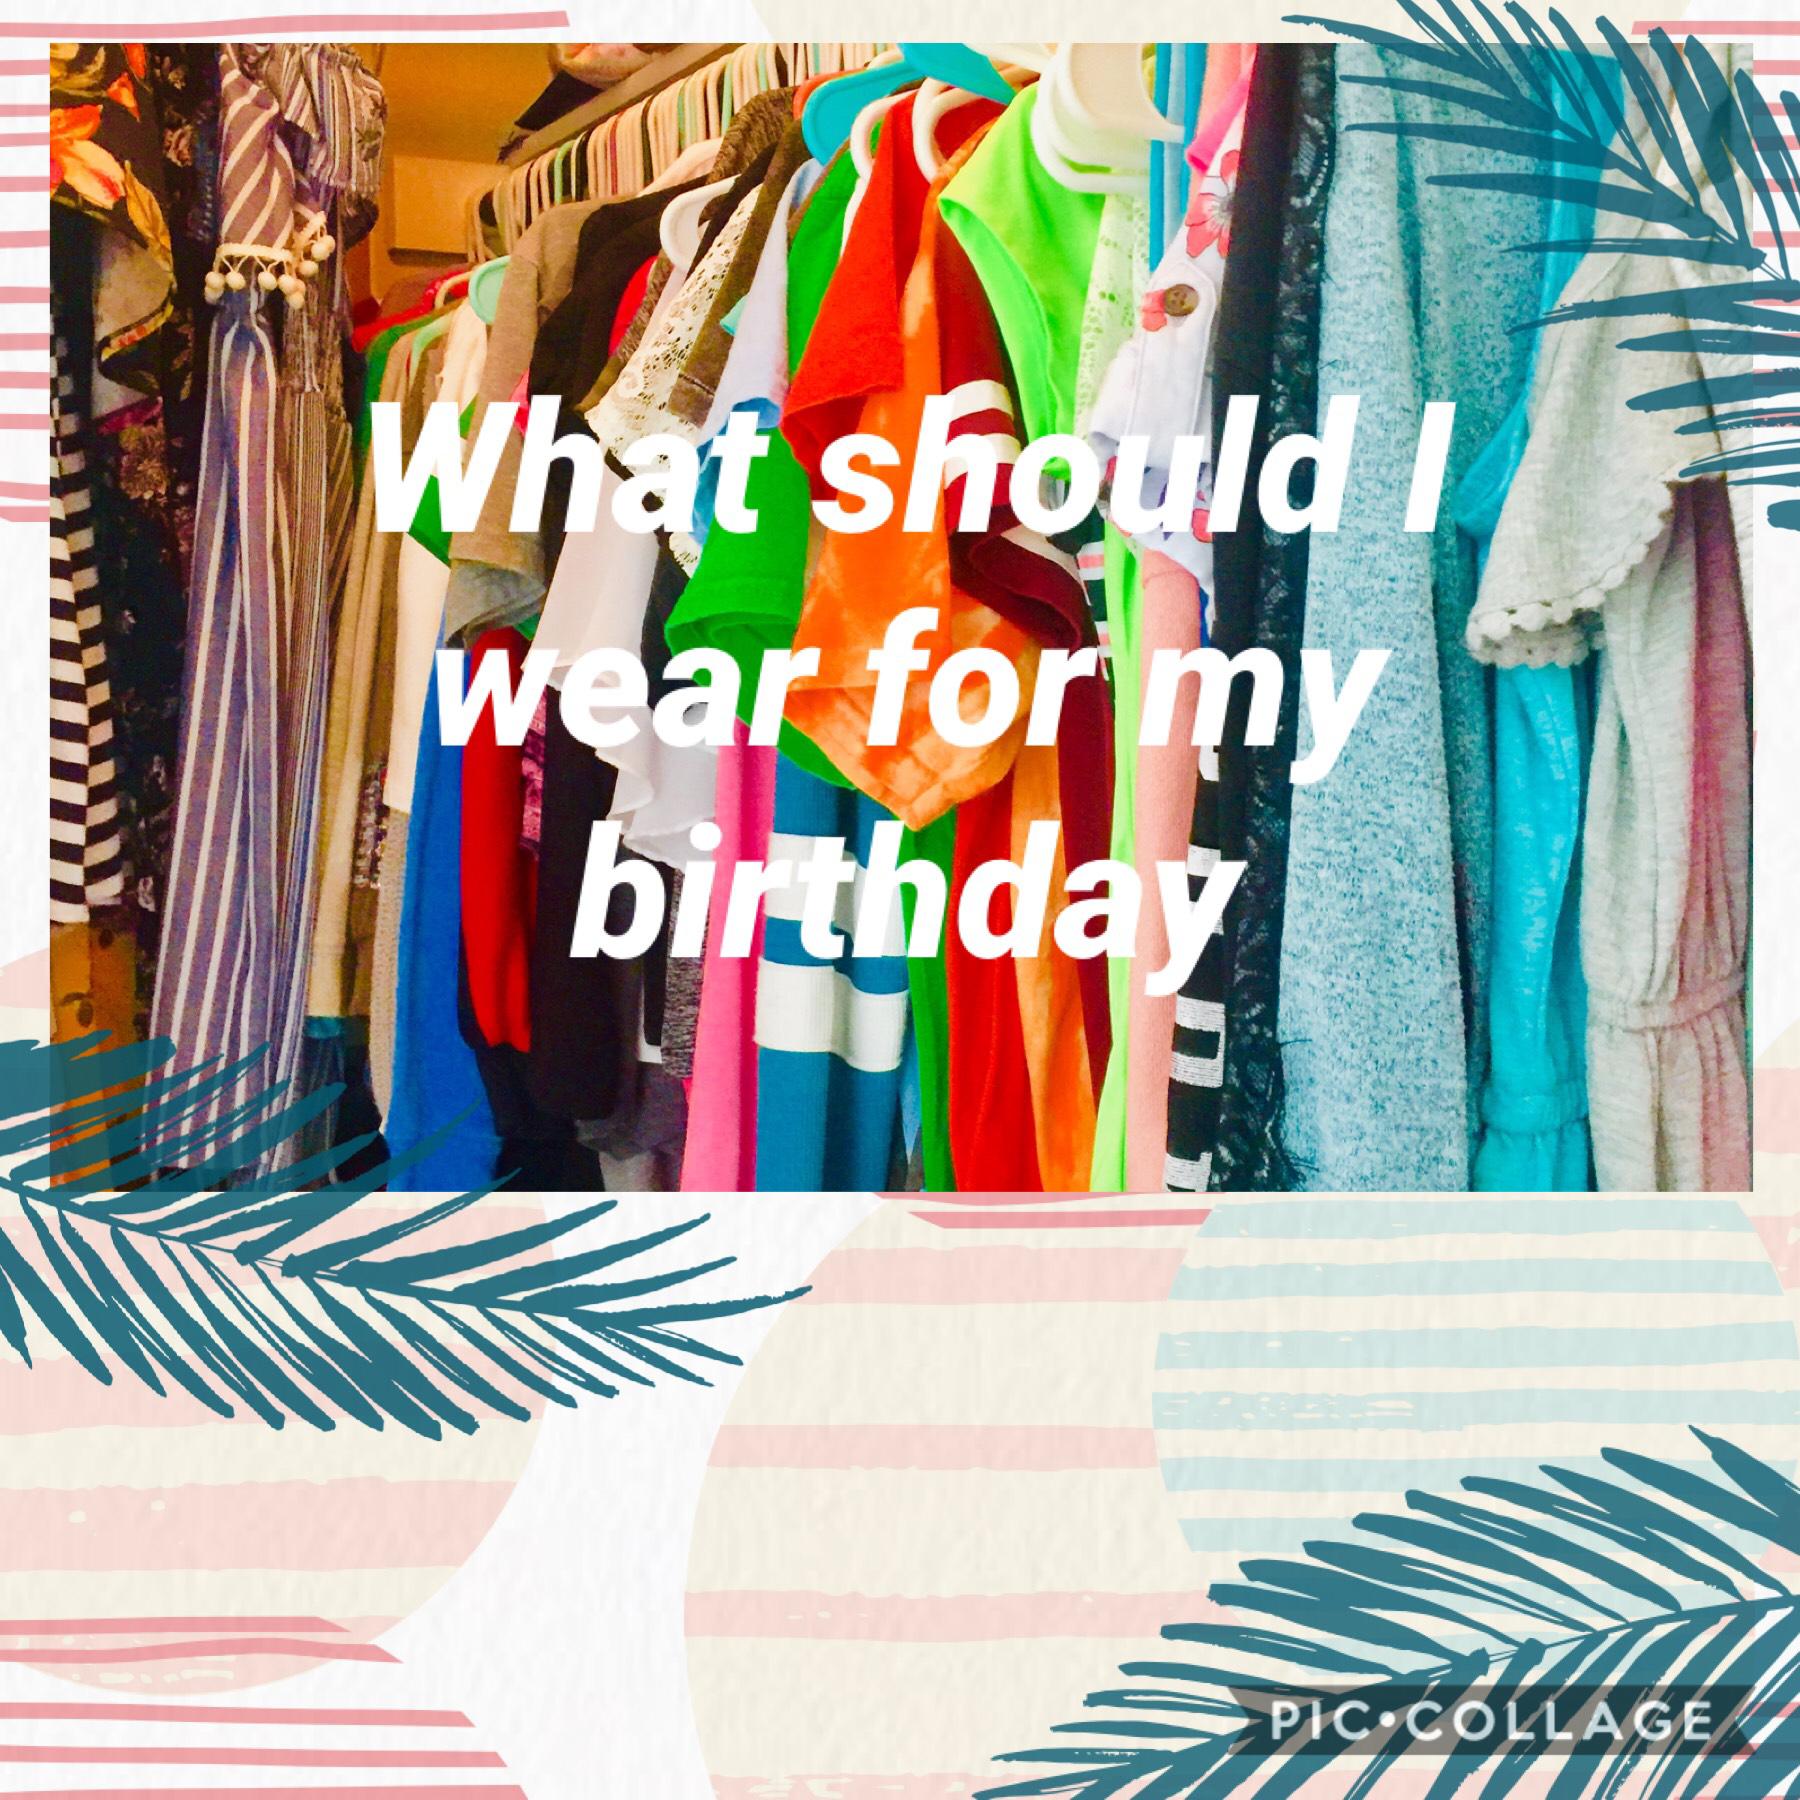 What should I wear? @Ashleyrosecarter_momofthree